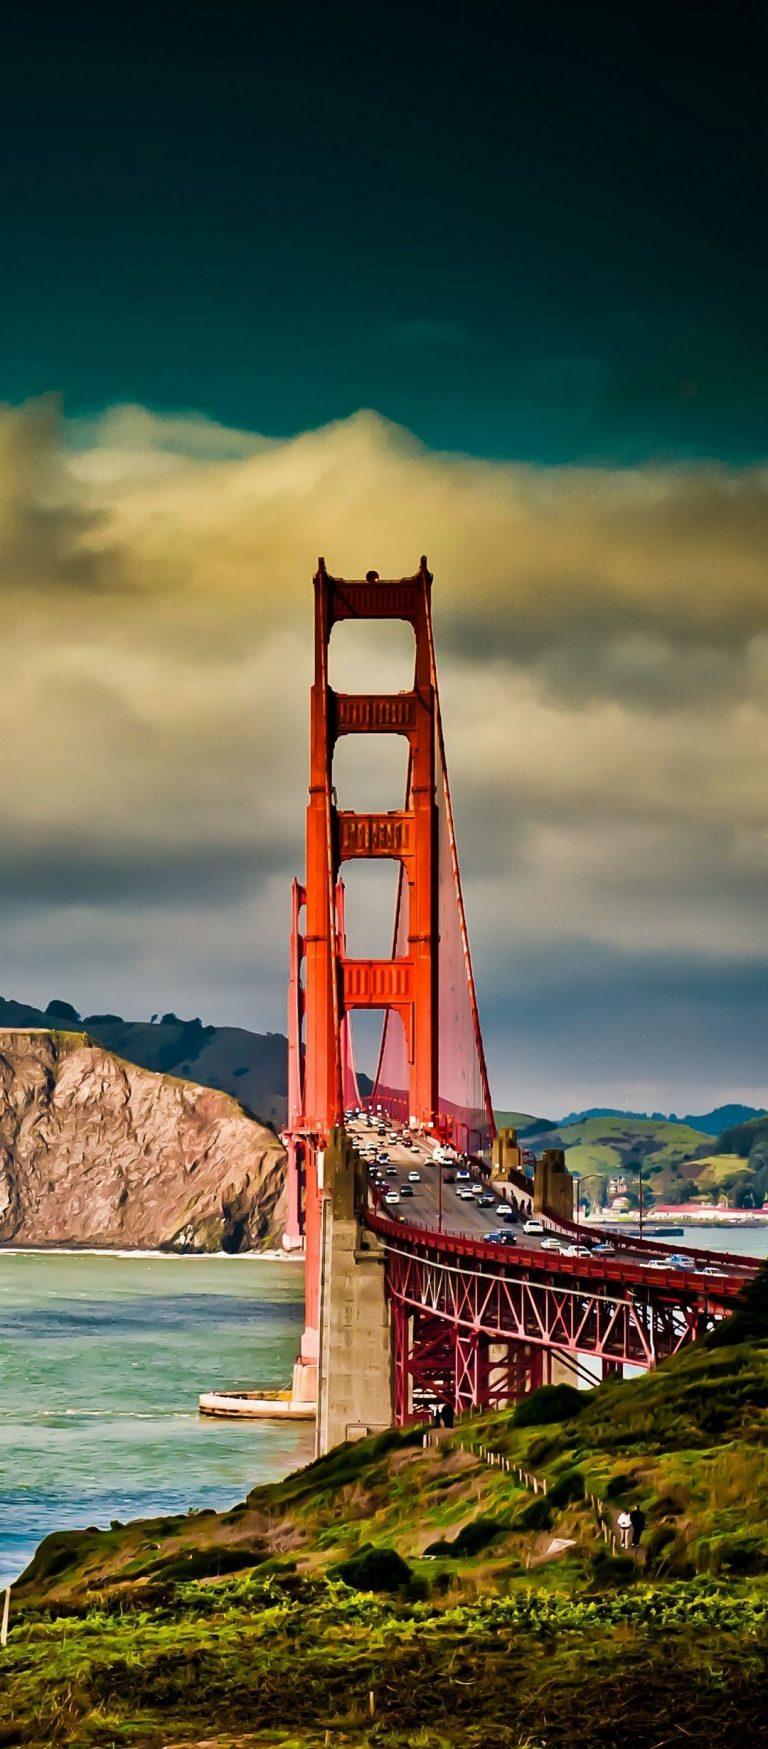 San Francisco Bridge Sky River 1080x2460 768x1749